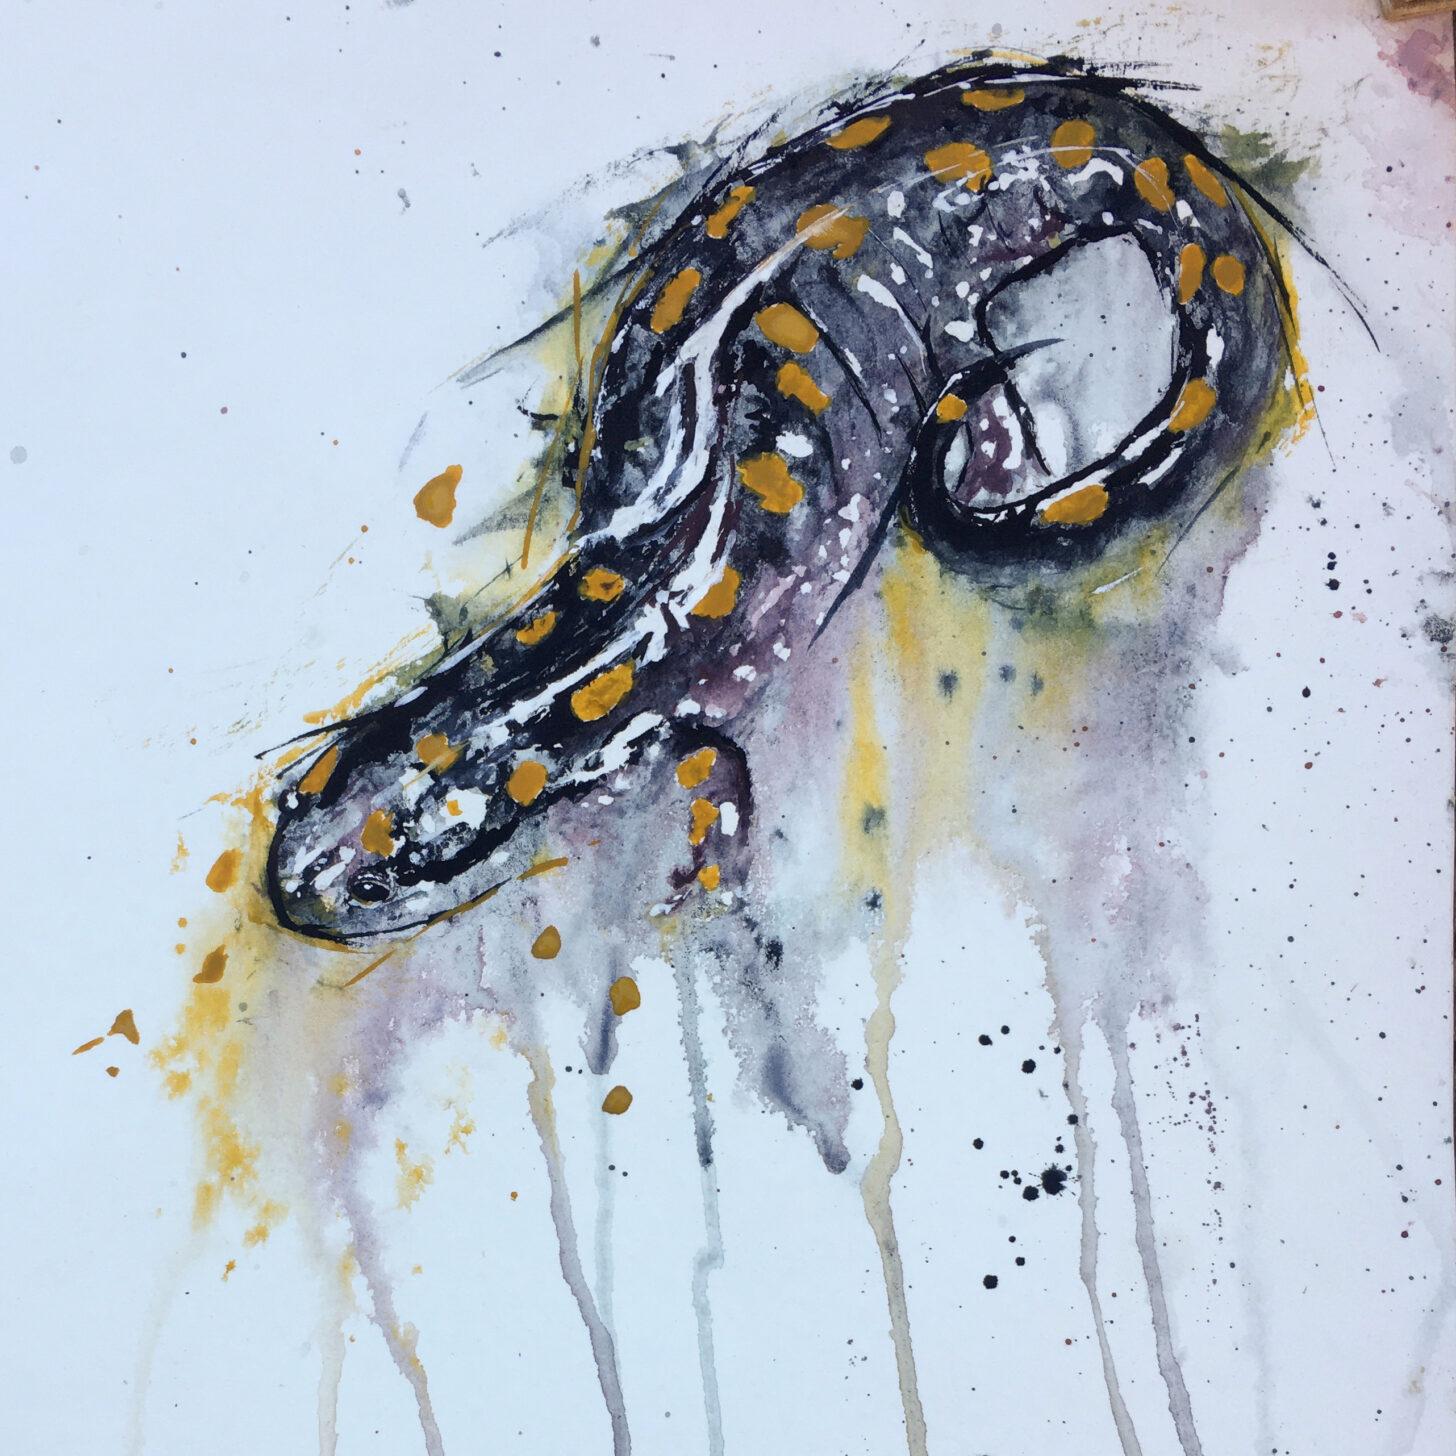 a watercolor painting of a salamander.